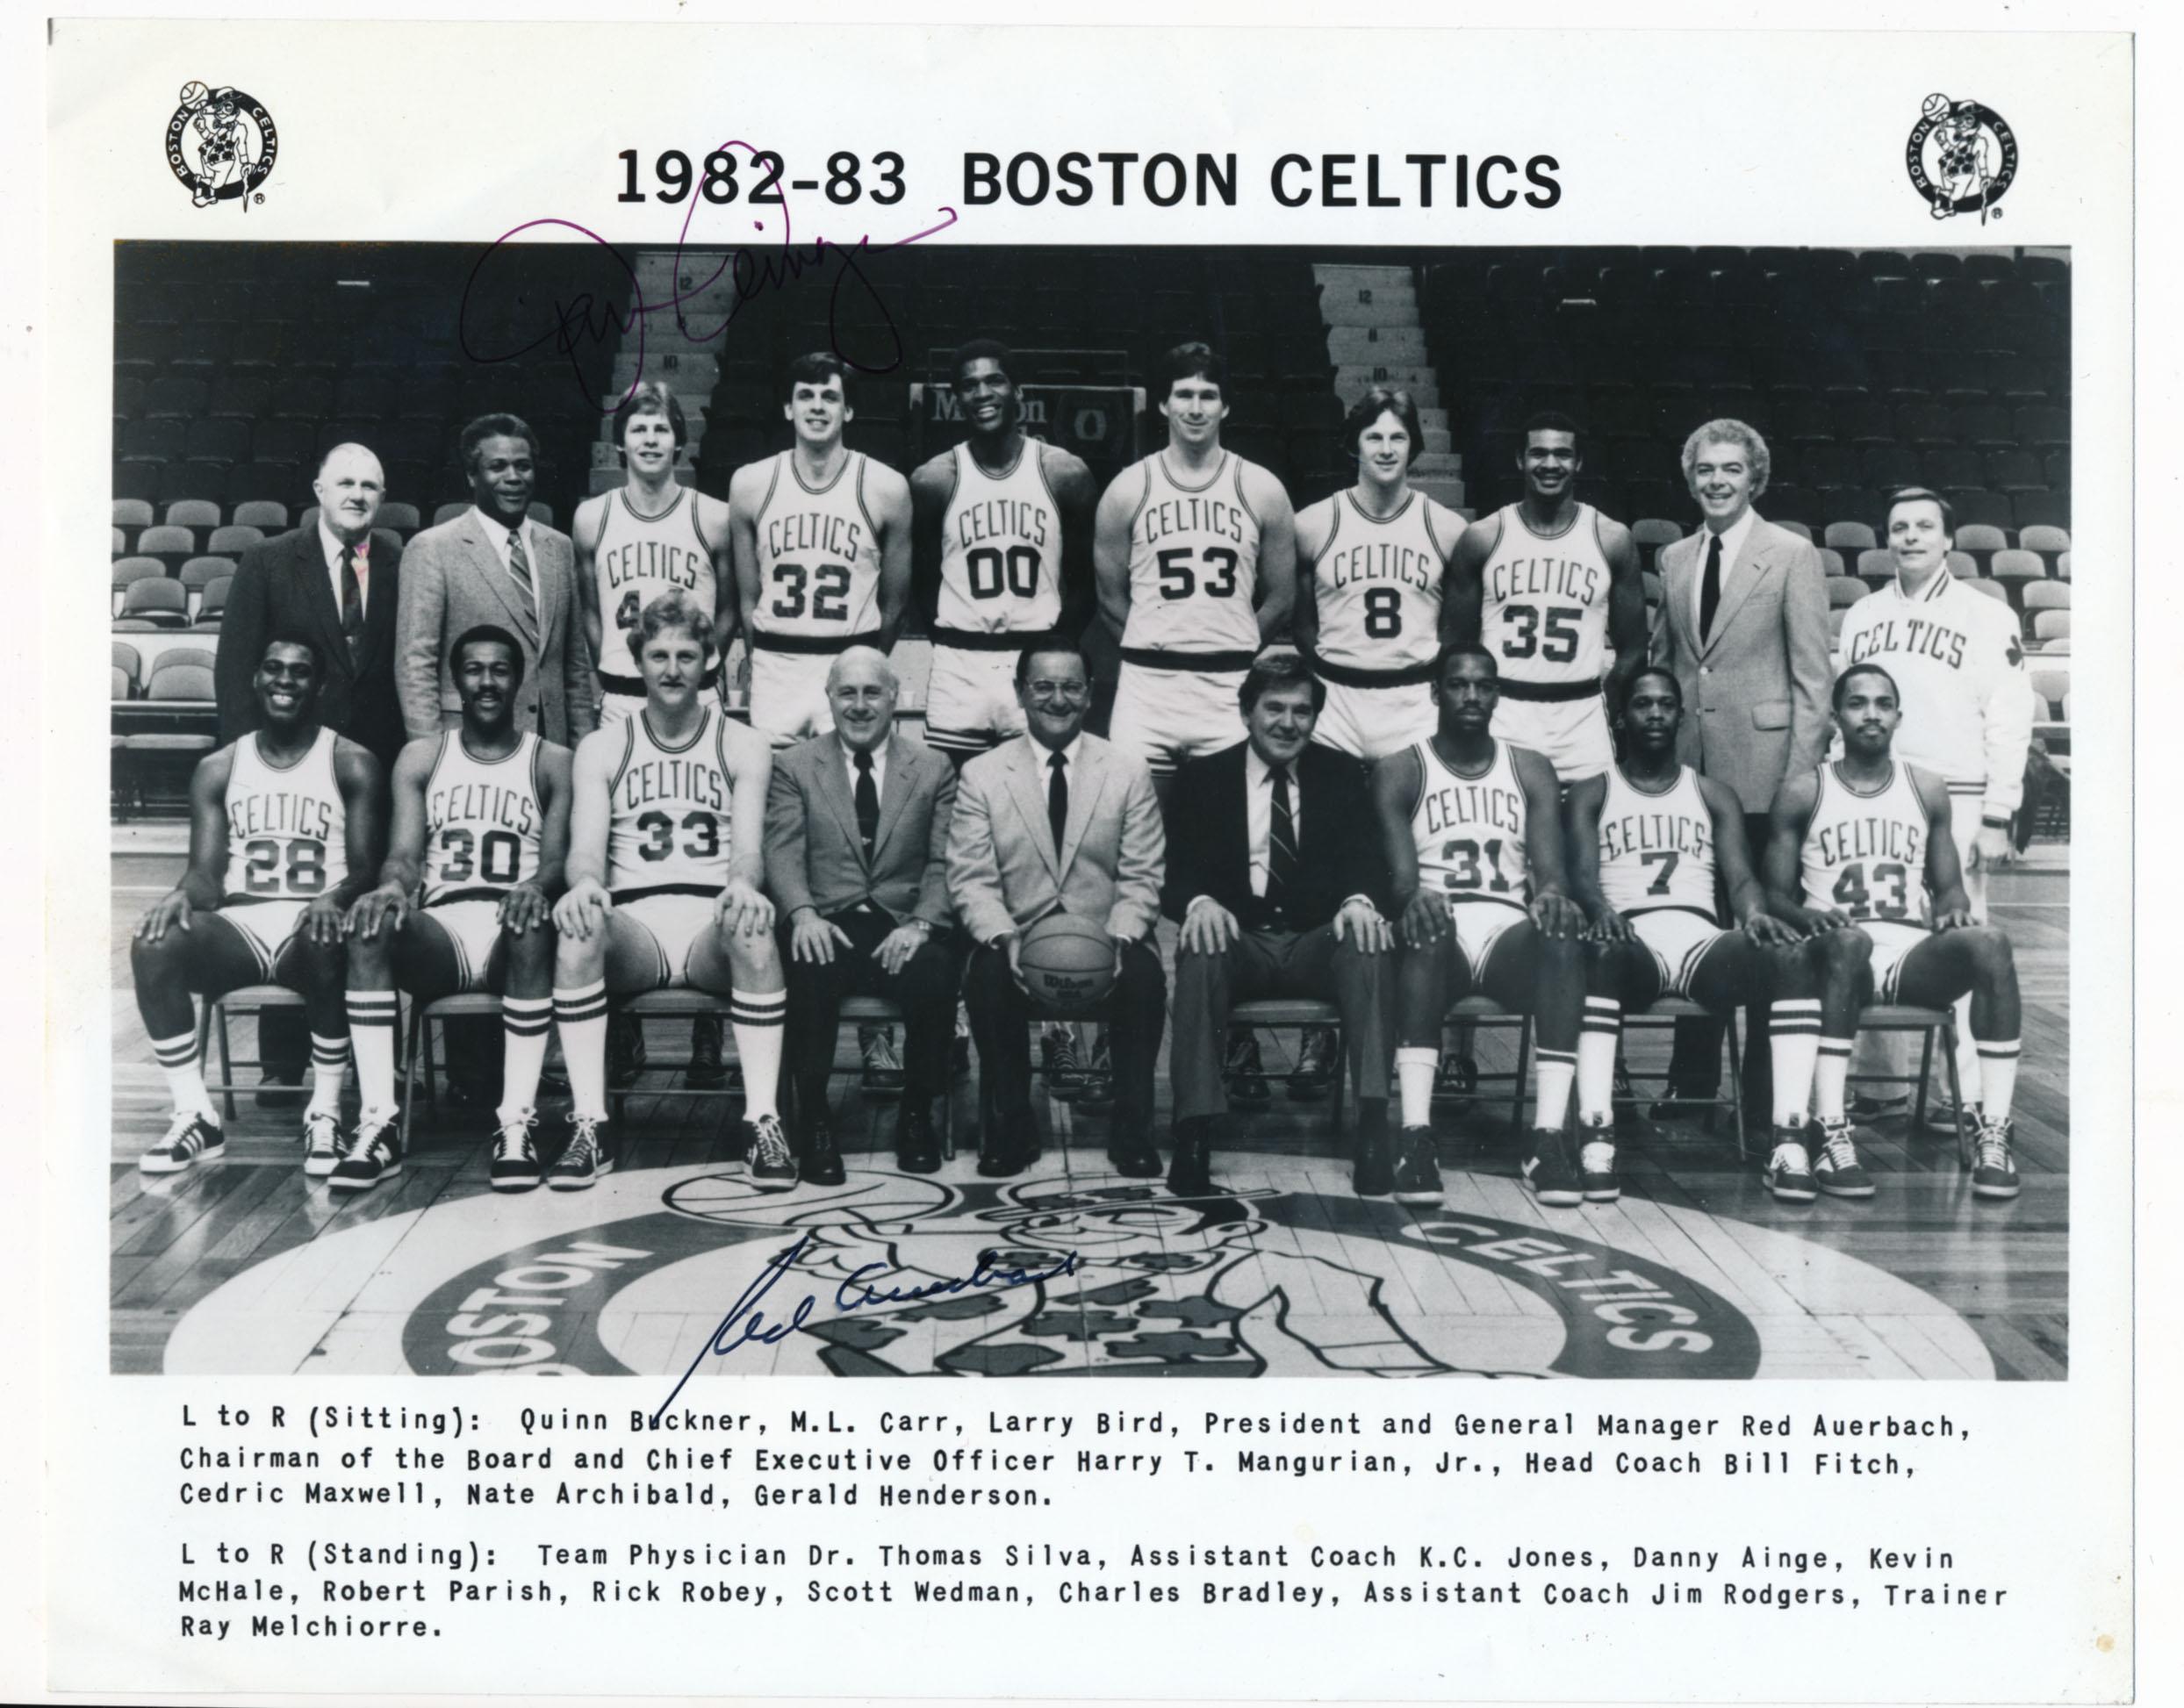 Lot #934  8 x 10  Auerbach, Red Signed 1982-83 Celtics Photo (JSA LOAA) Cond: 8